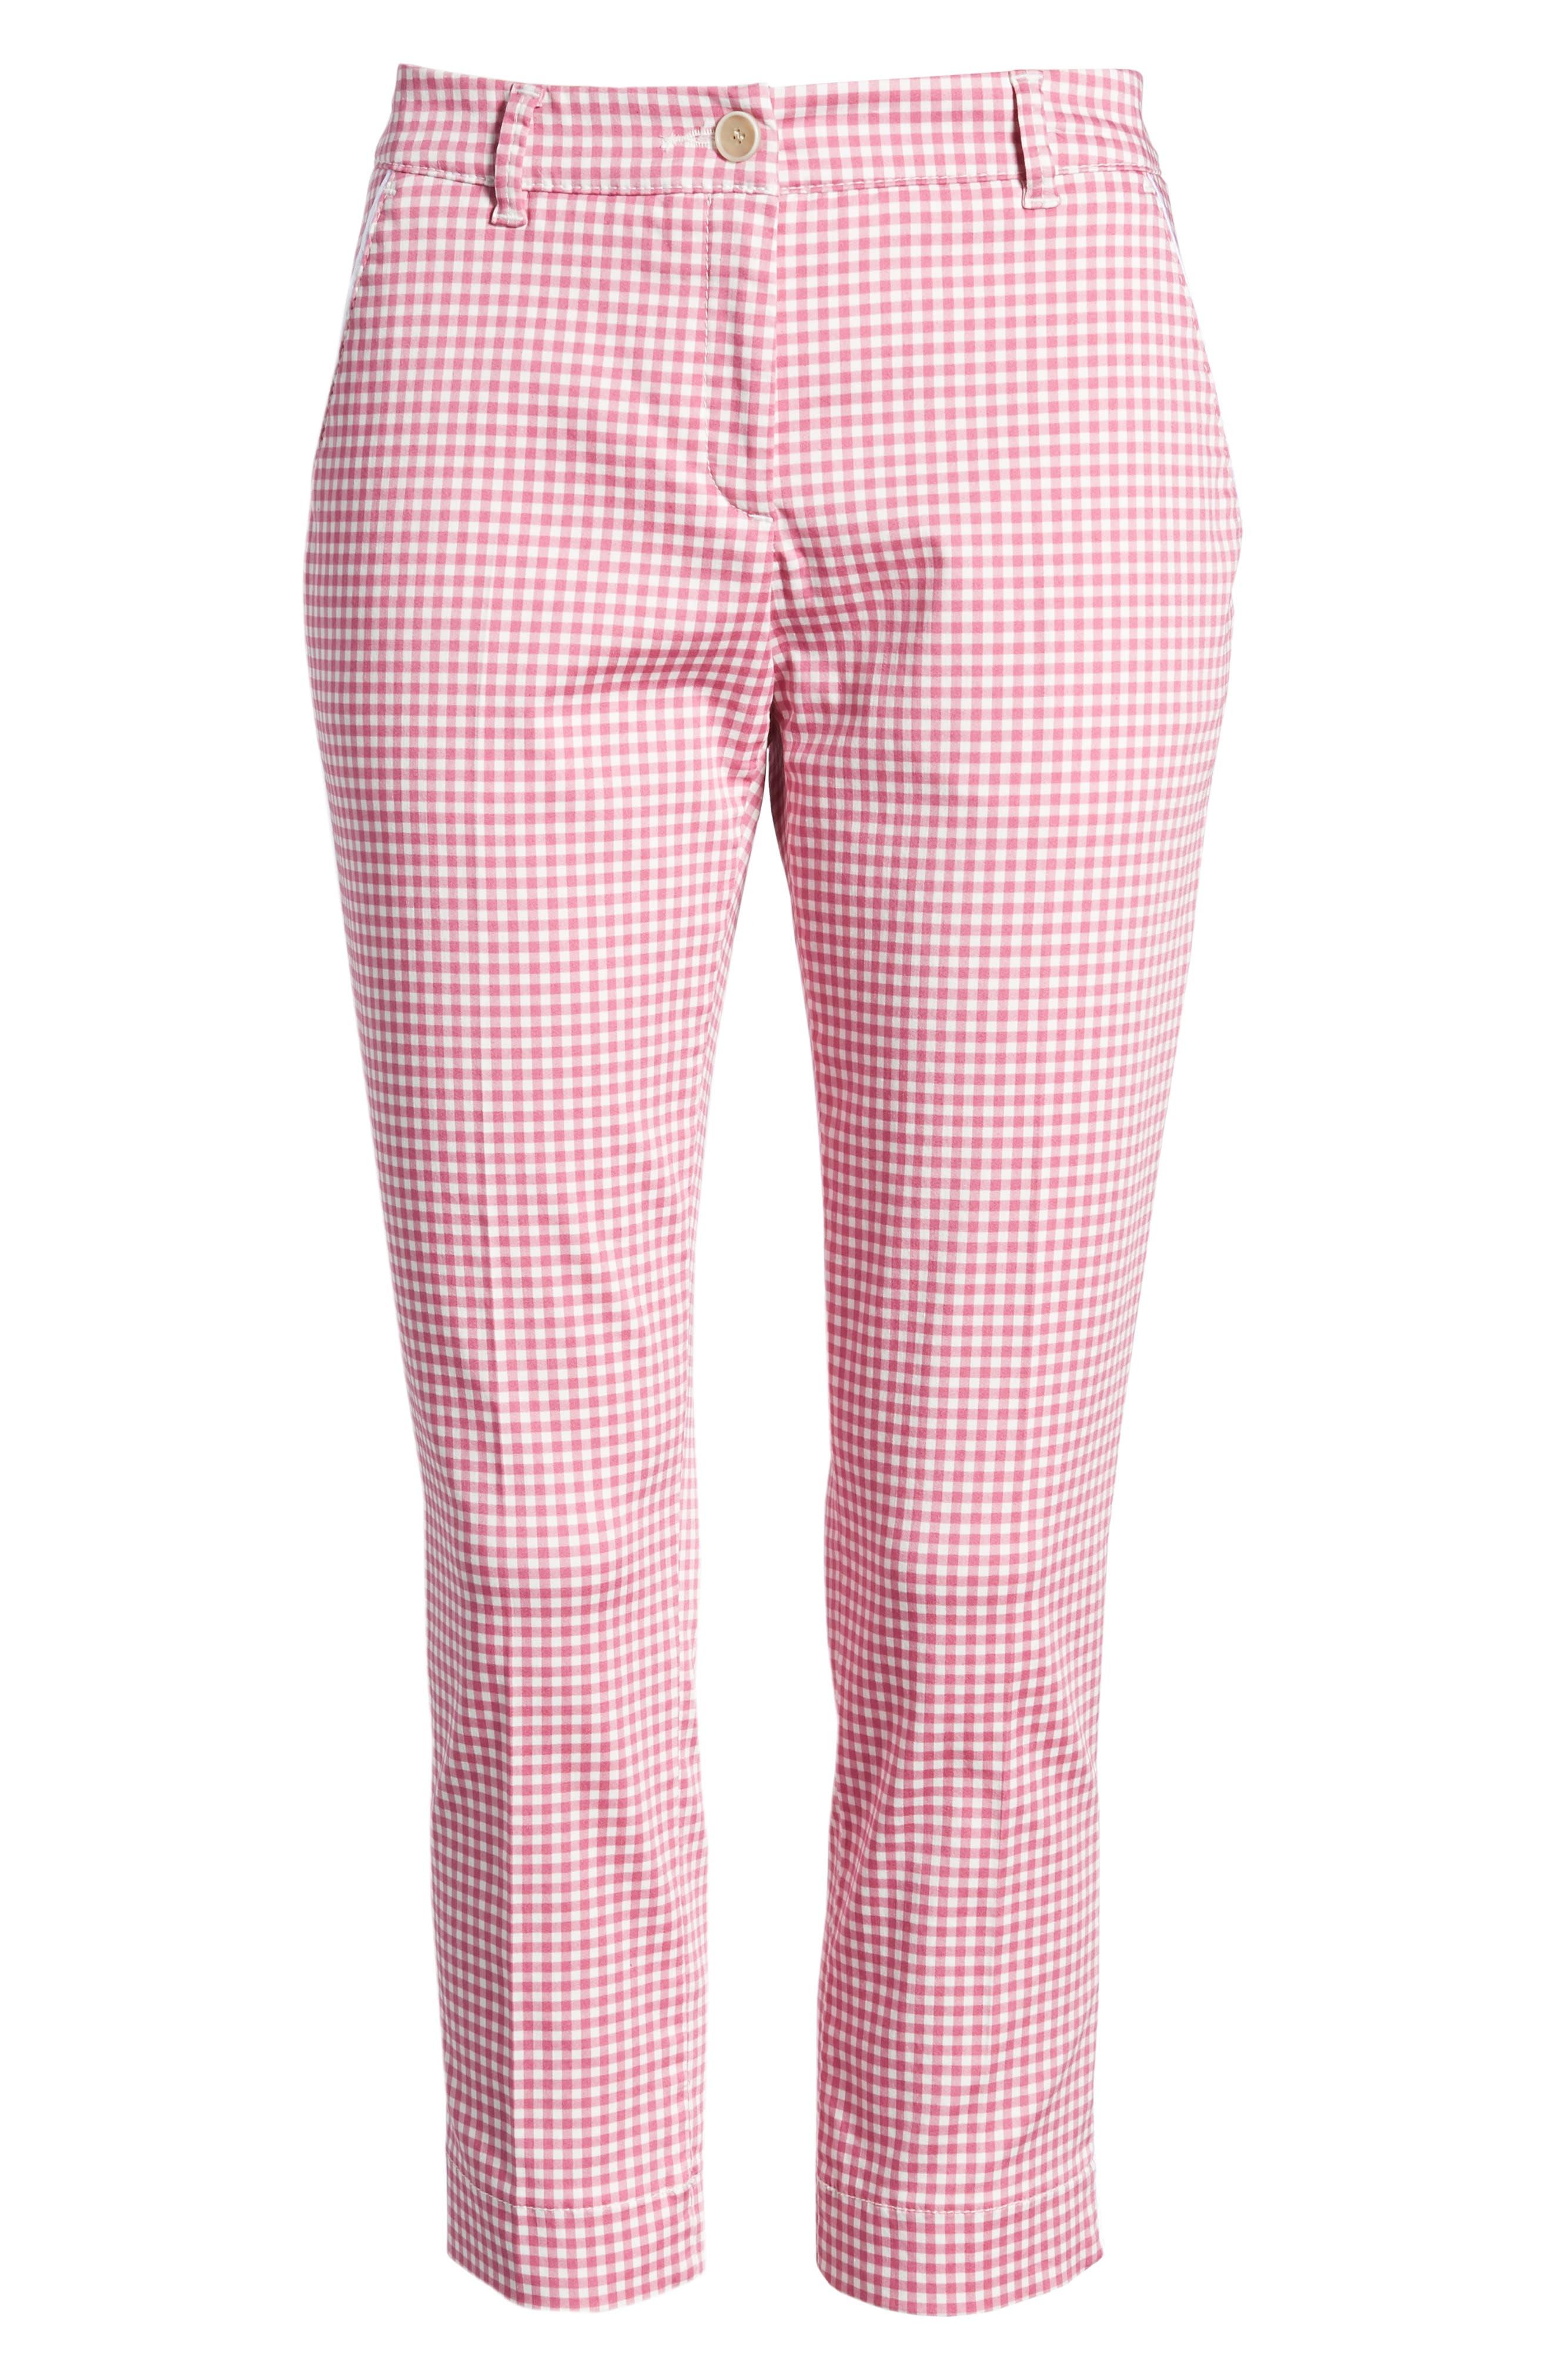 Maron Gingham Stretch Cotton Pants,                             Alternate thumbnail 6, color,